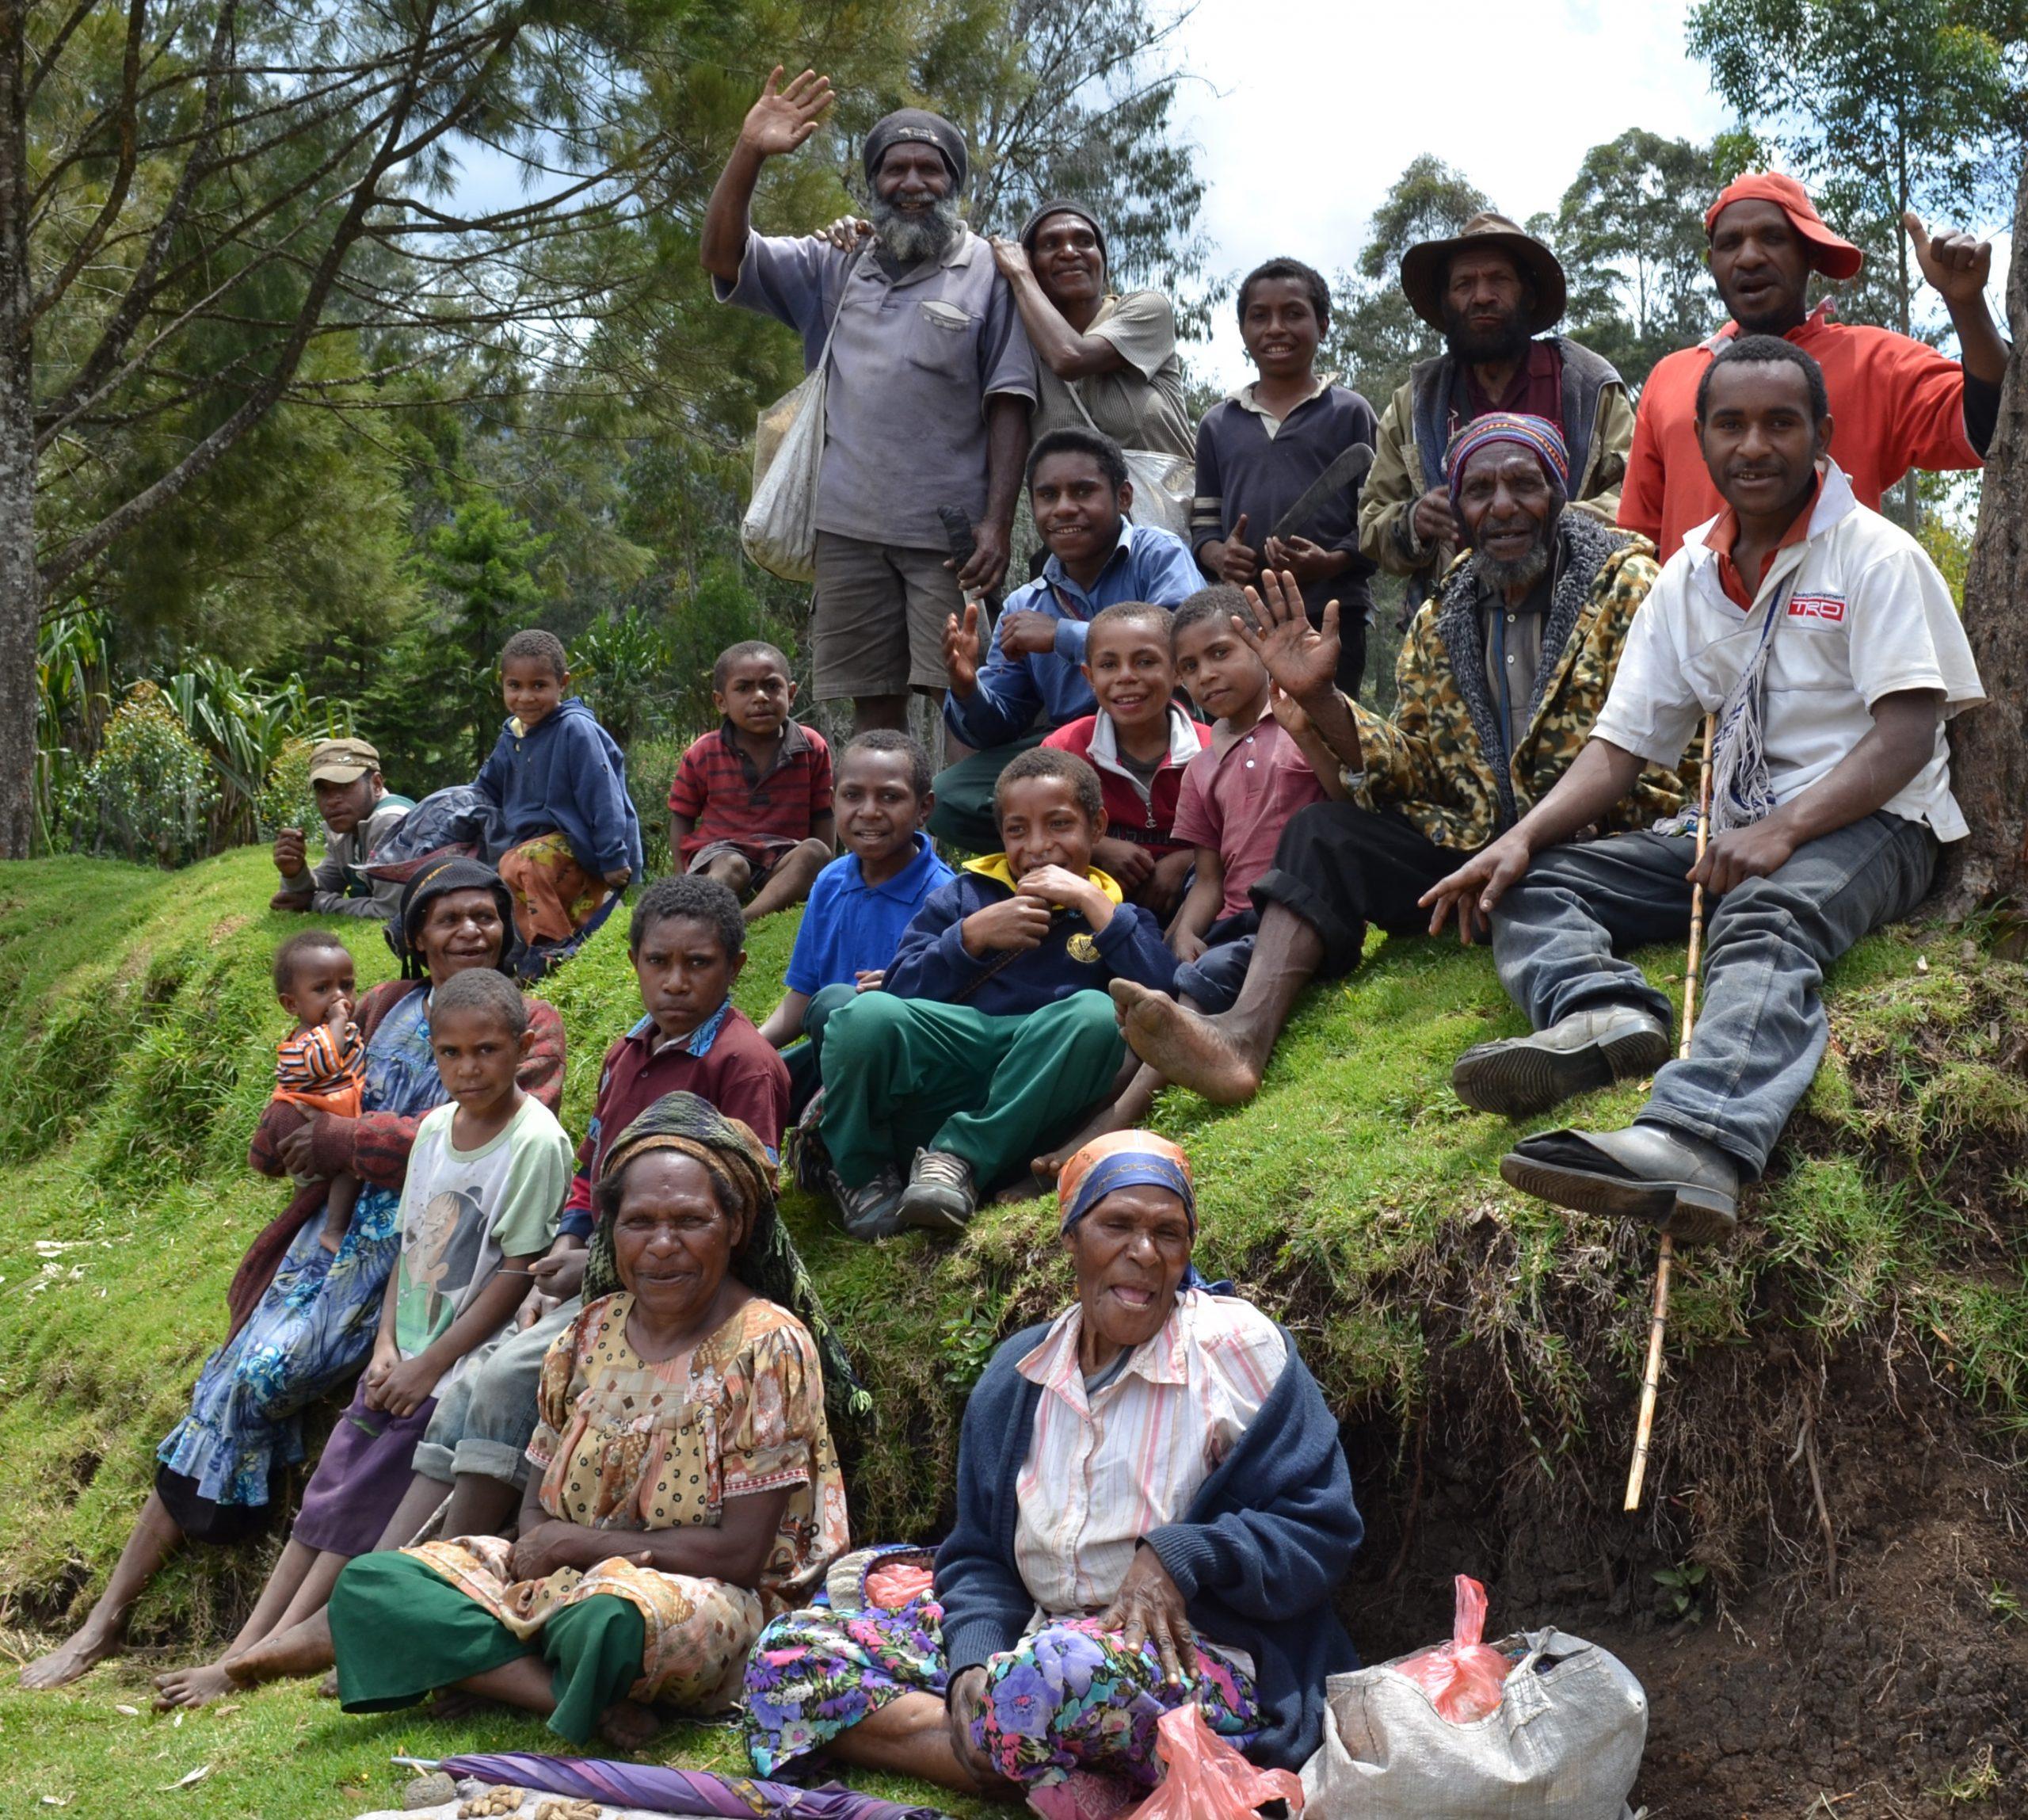 People of Papua New Guinea